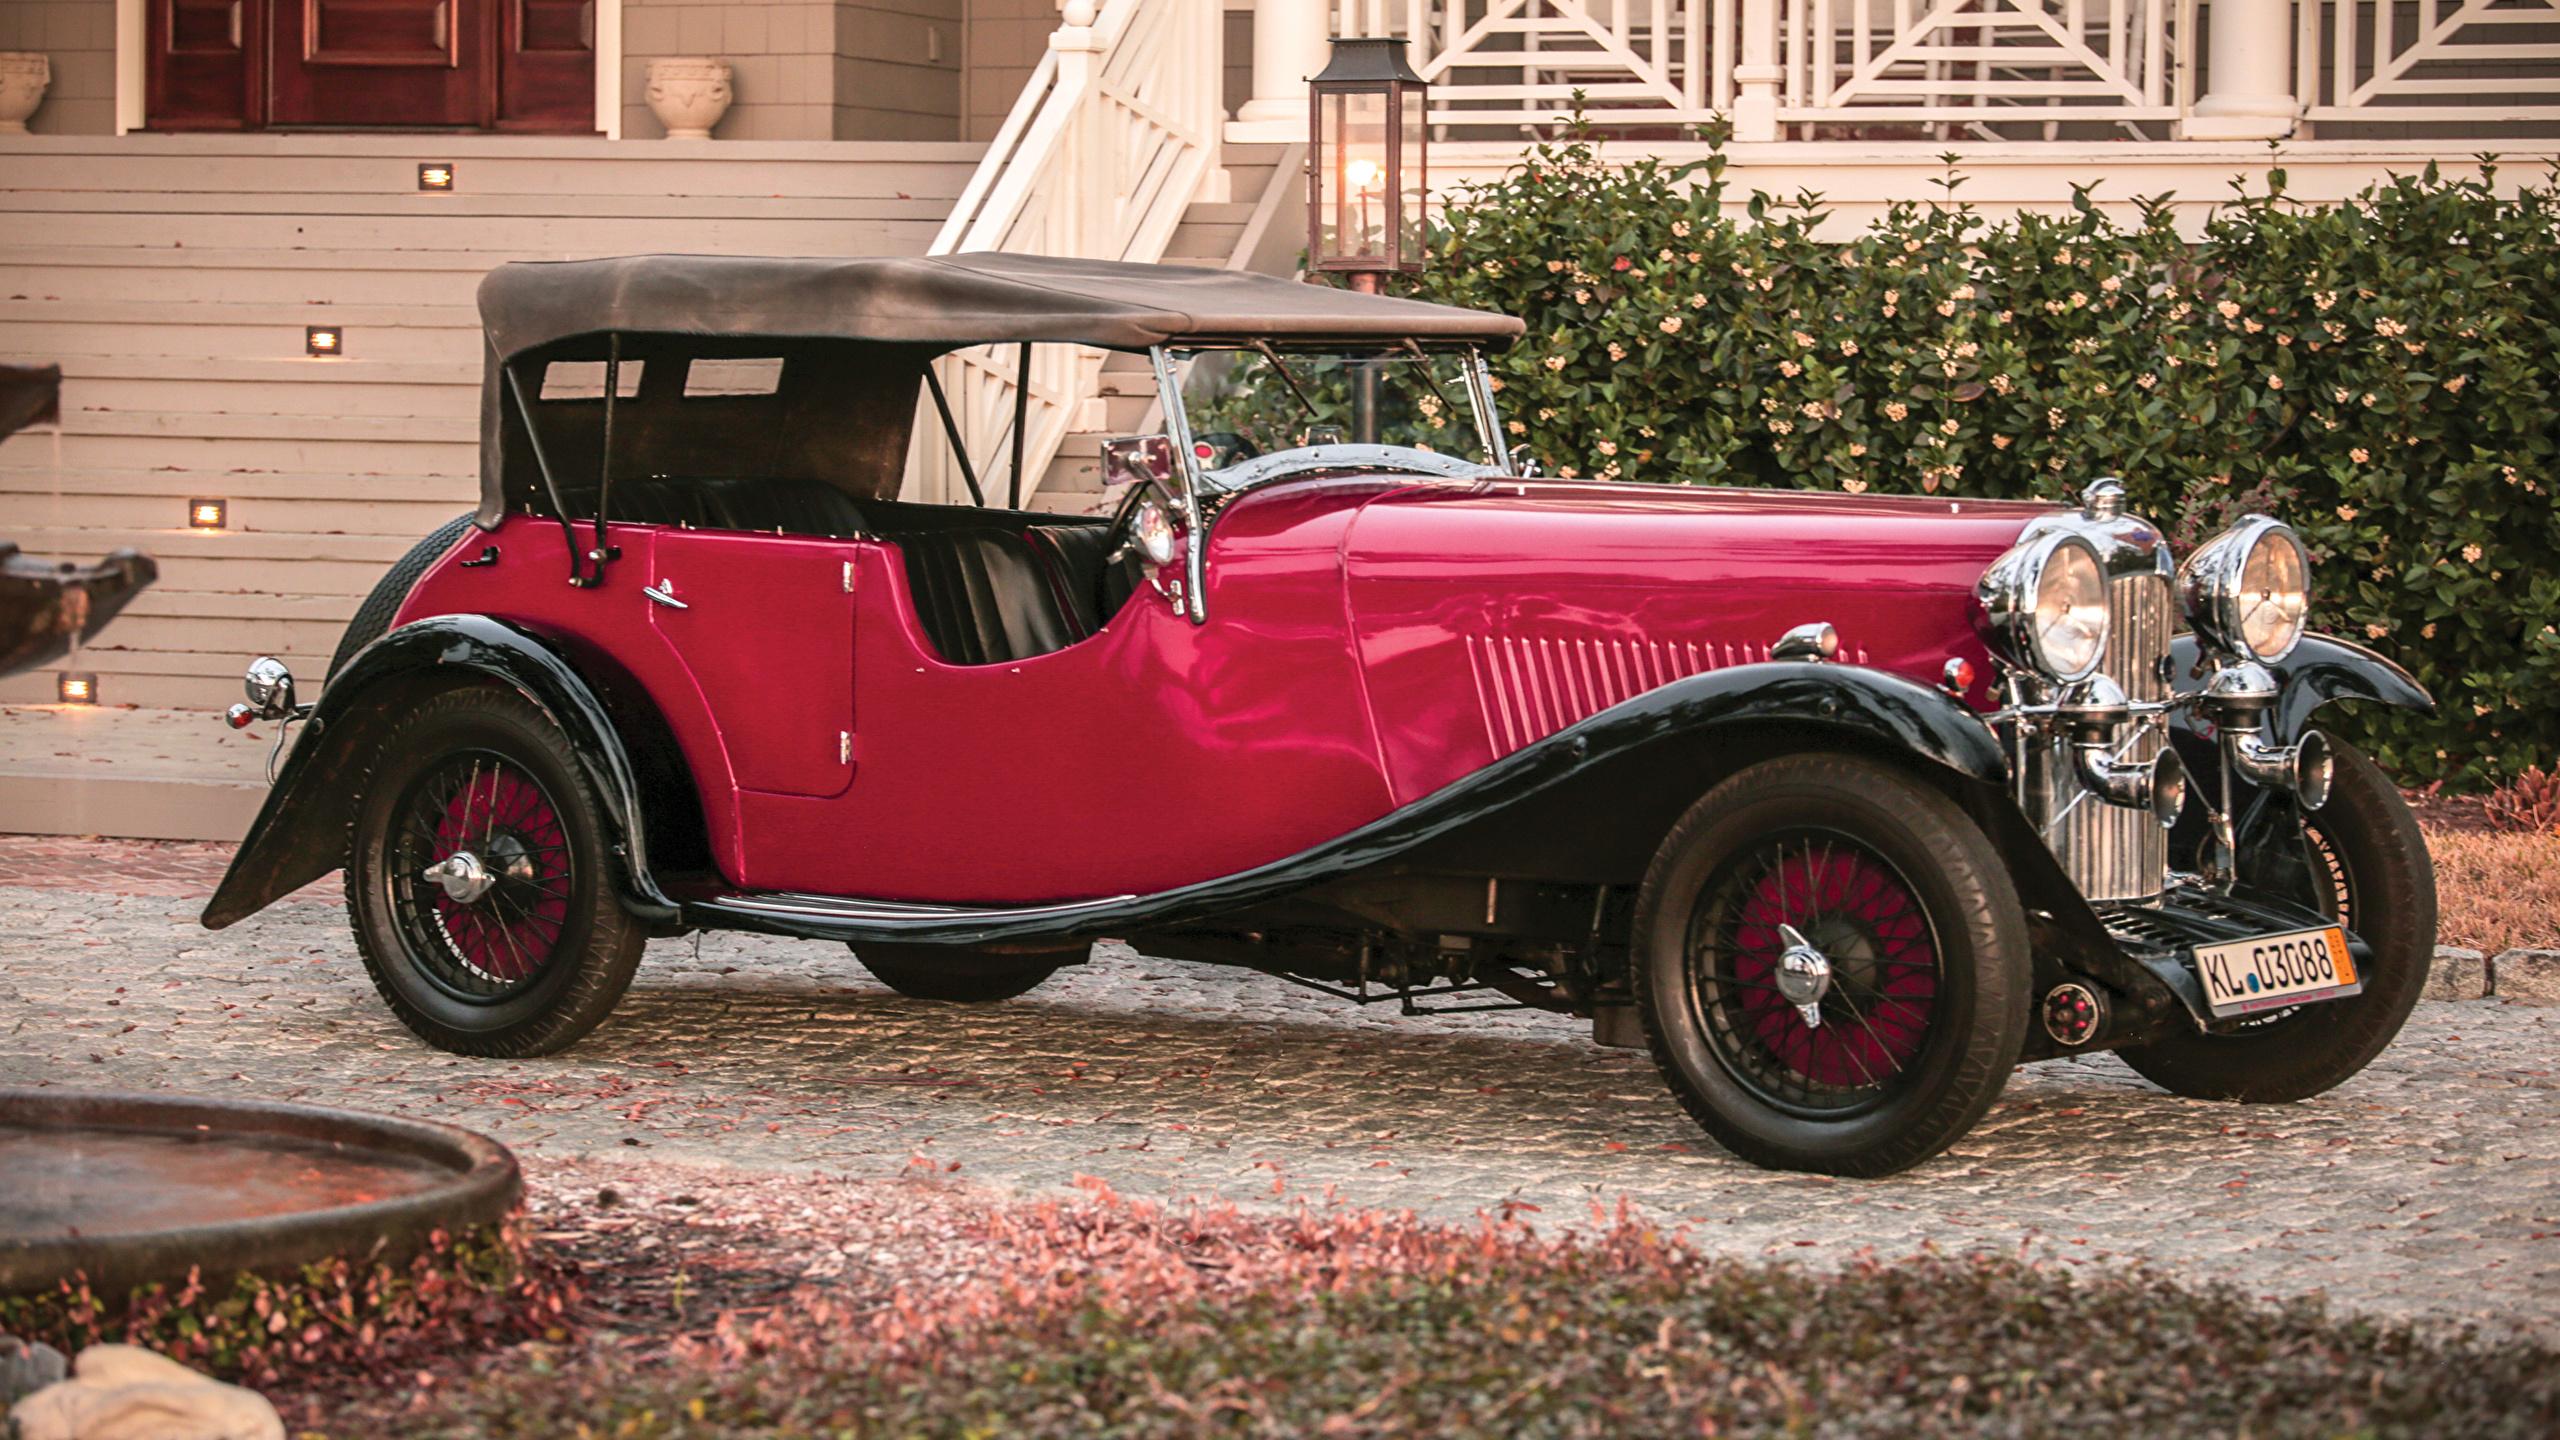 Photos 1934 Lagonda 16 80 Tourer Red Vintage Cars Metallic 2560x1440